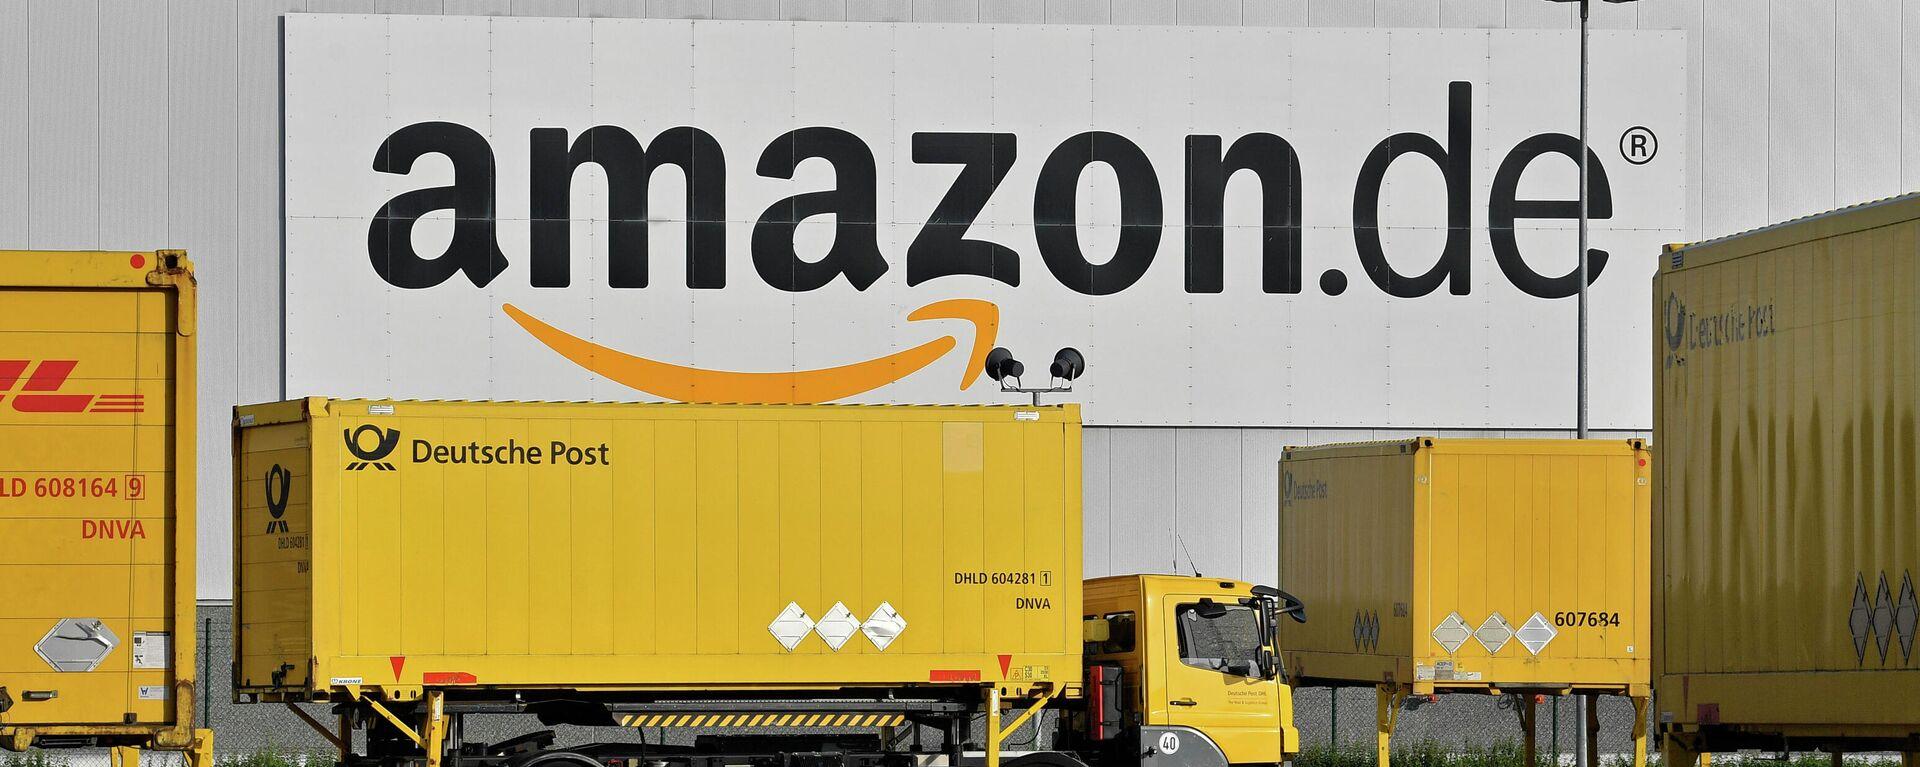 Centro logístico de Amazon en Rheinberg, Alemania - Sputnik Mundo, 1920, 29.03.2021